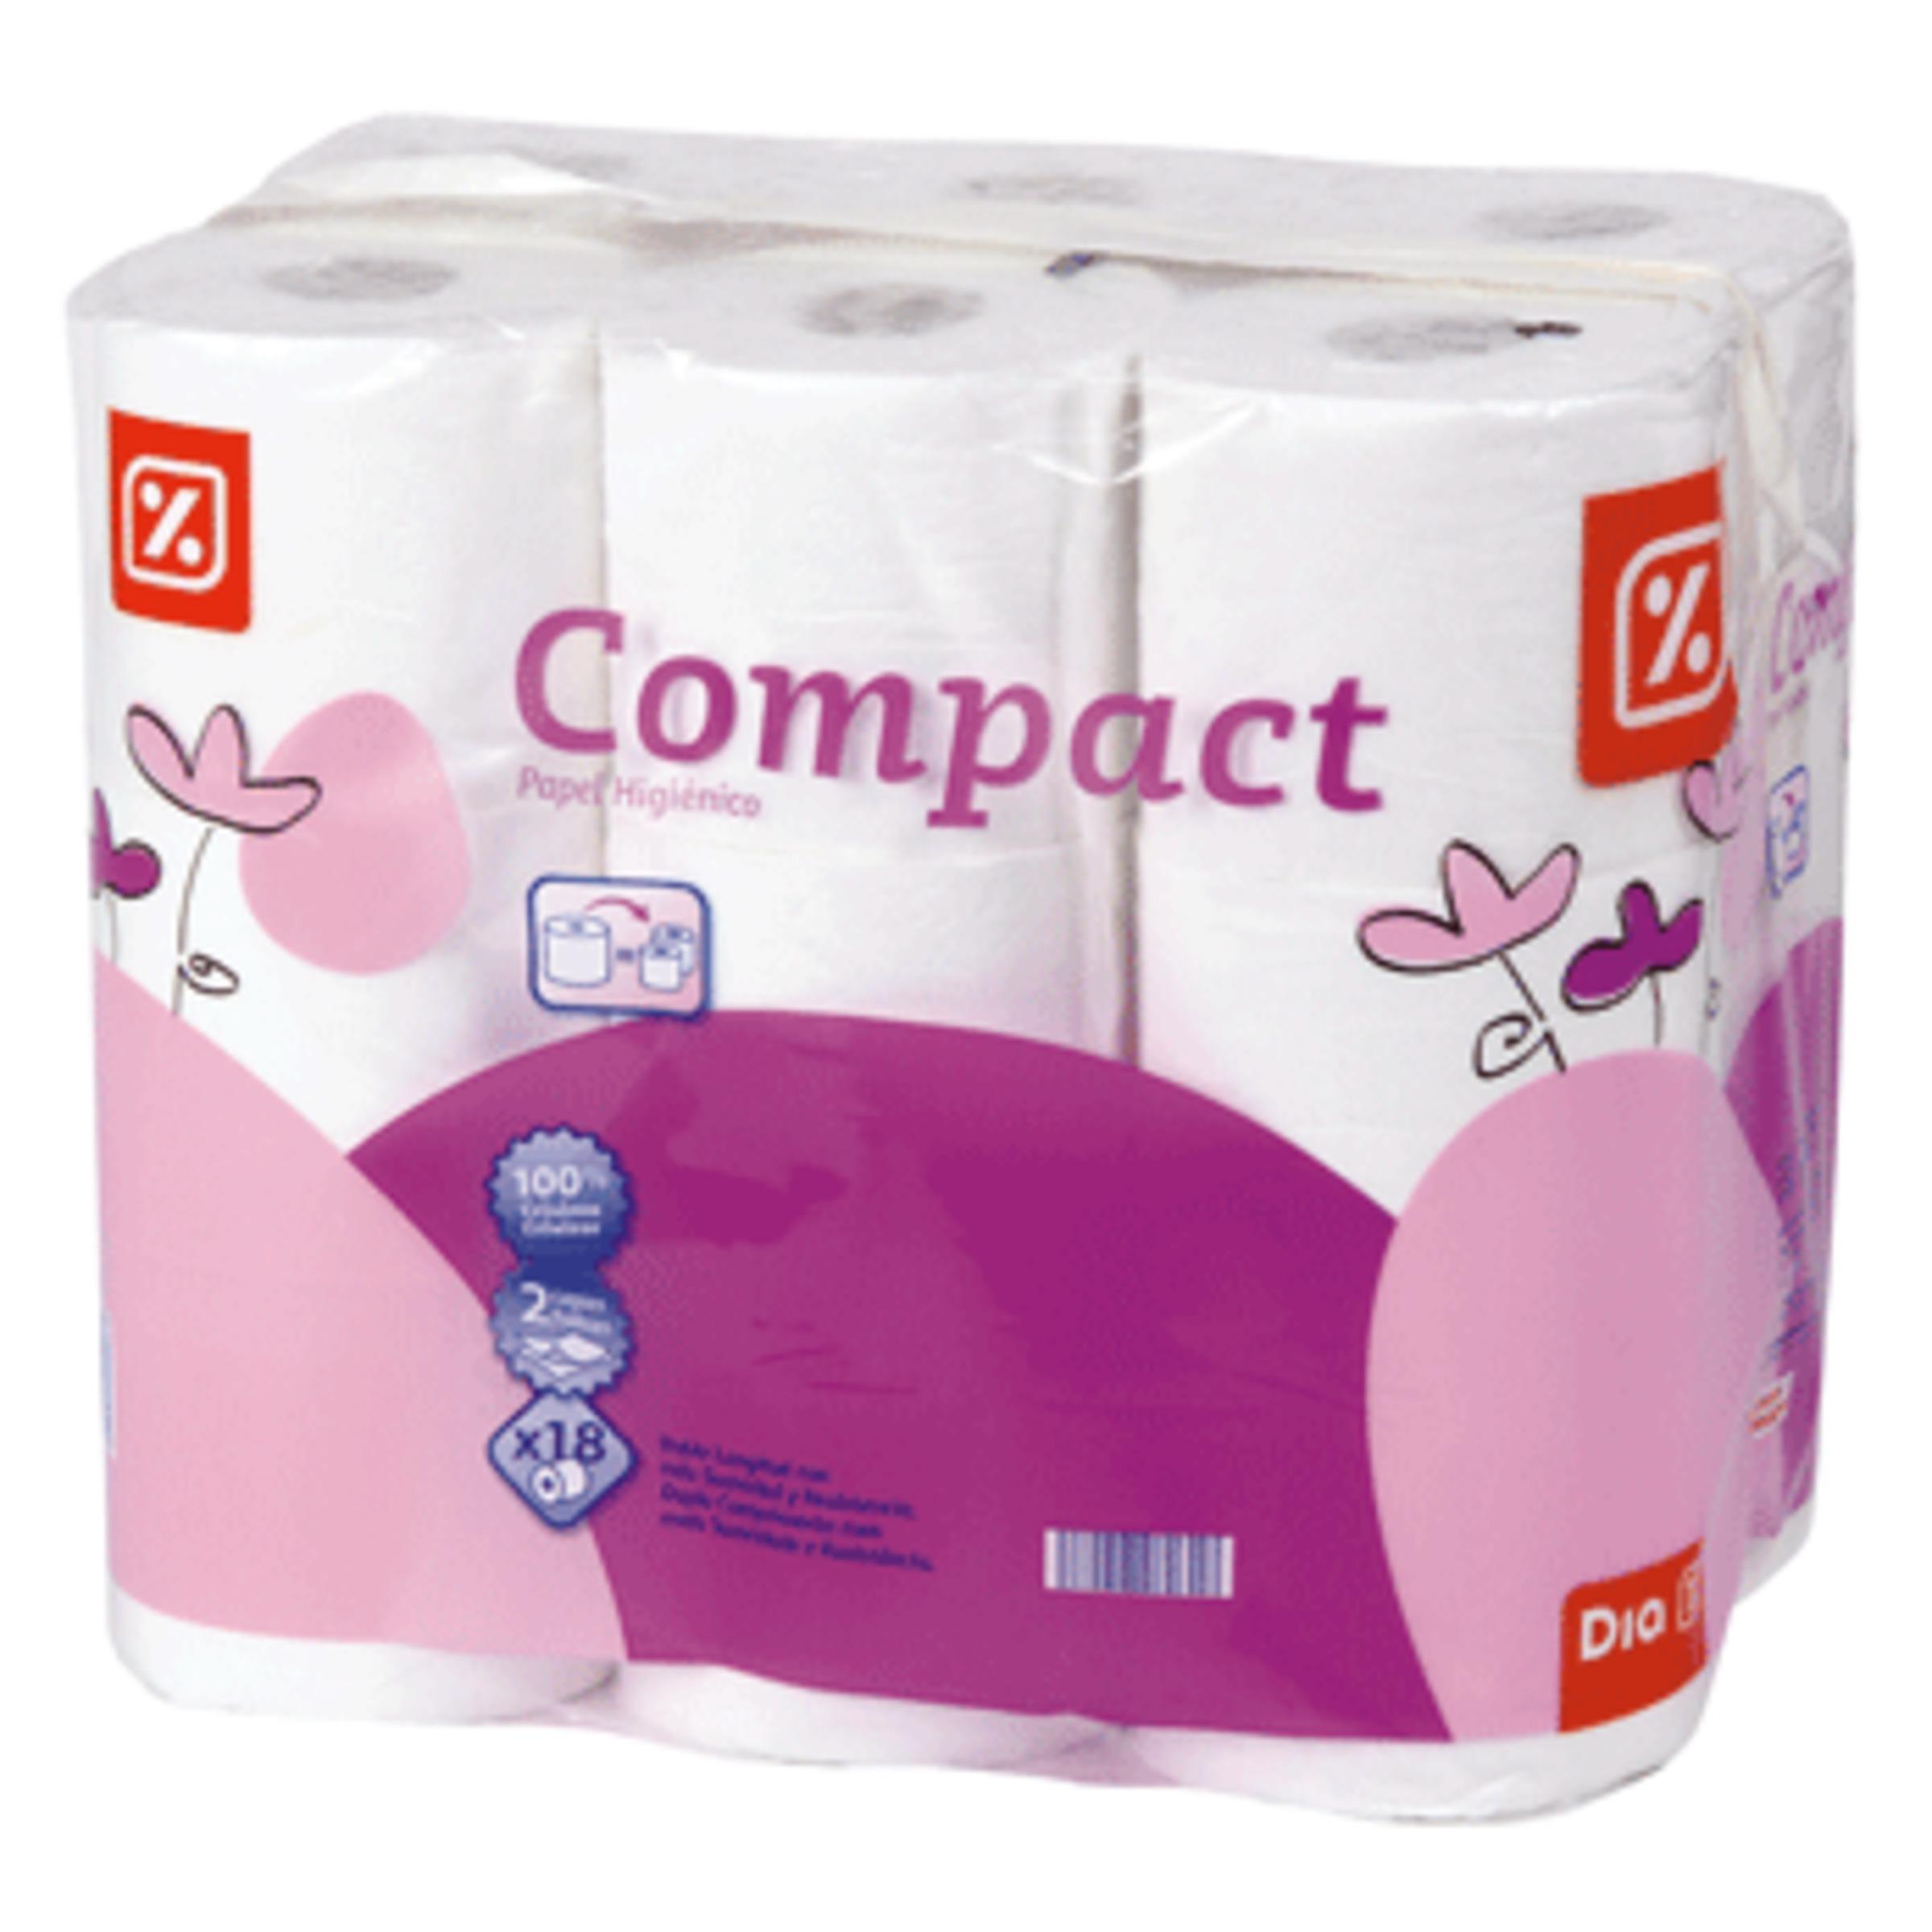 Dia papel higi nico compacto blanco paquete 18 uds papel for Accesorios para bano papel higienico